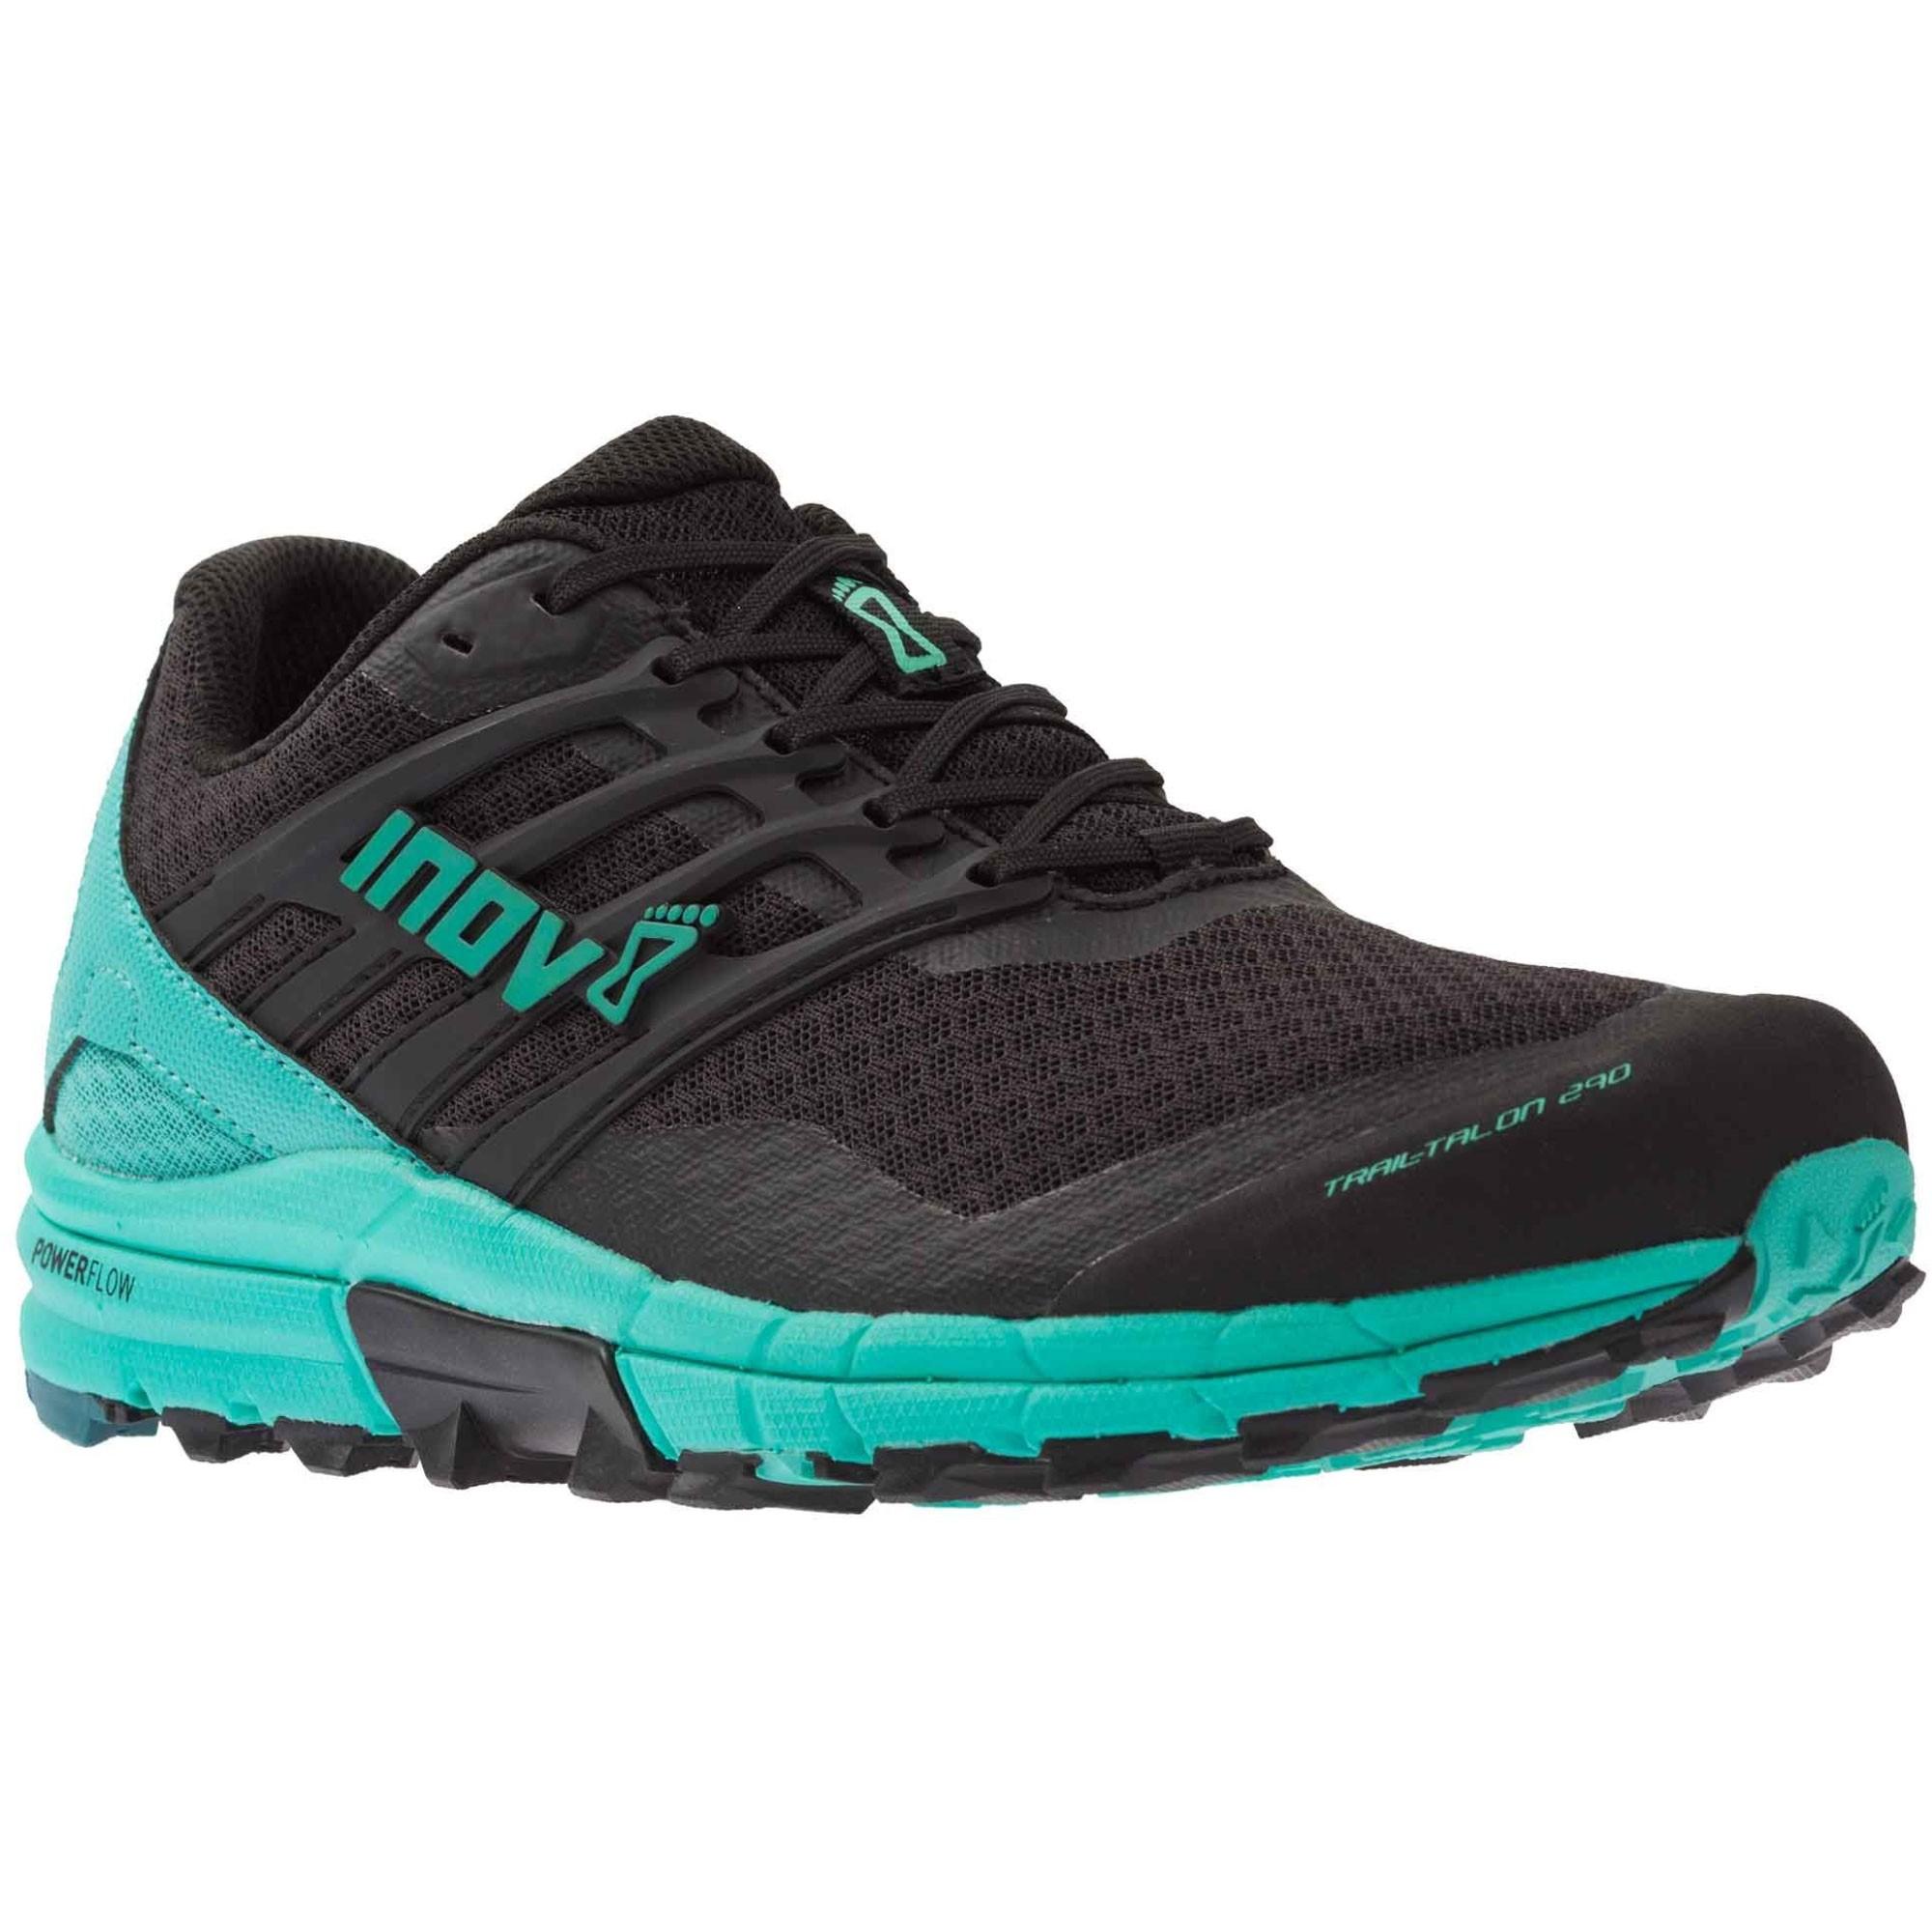 Inov8 Trail Talon 290 Trail Running Shoes - Black/Teal - Angle